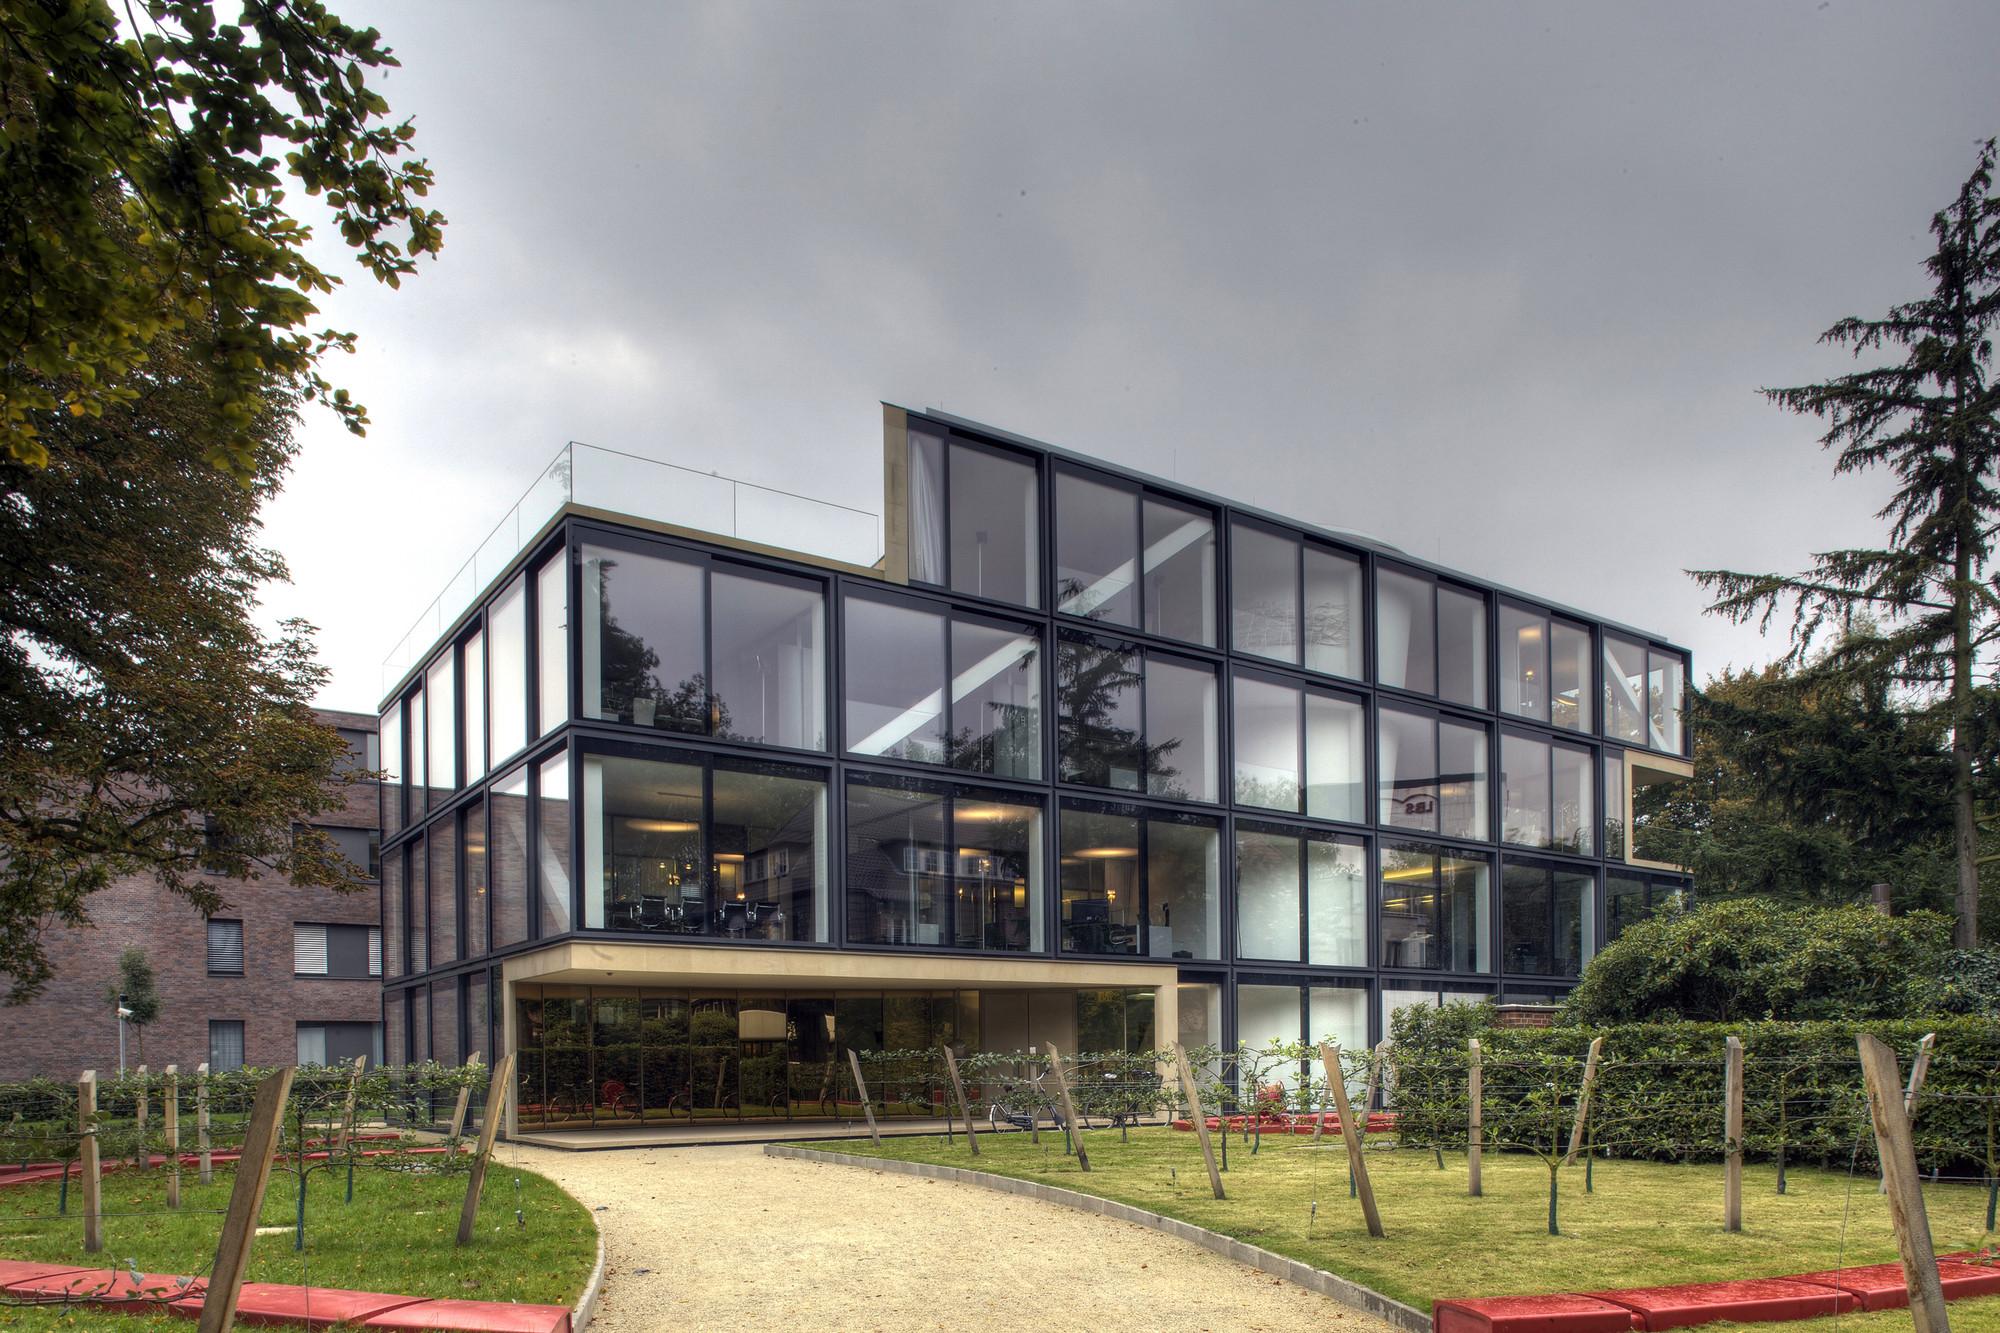 Office Building / Allmann Sattler Wappner Architekten